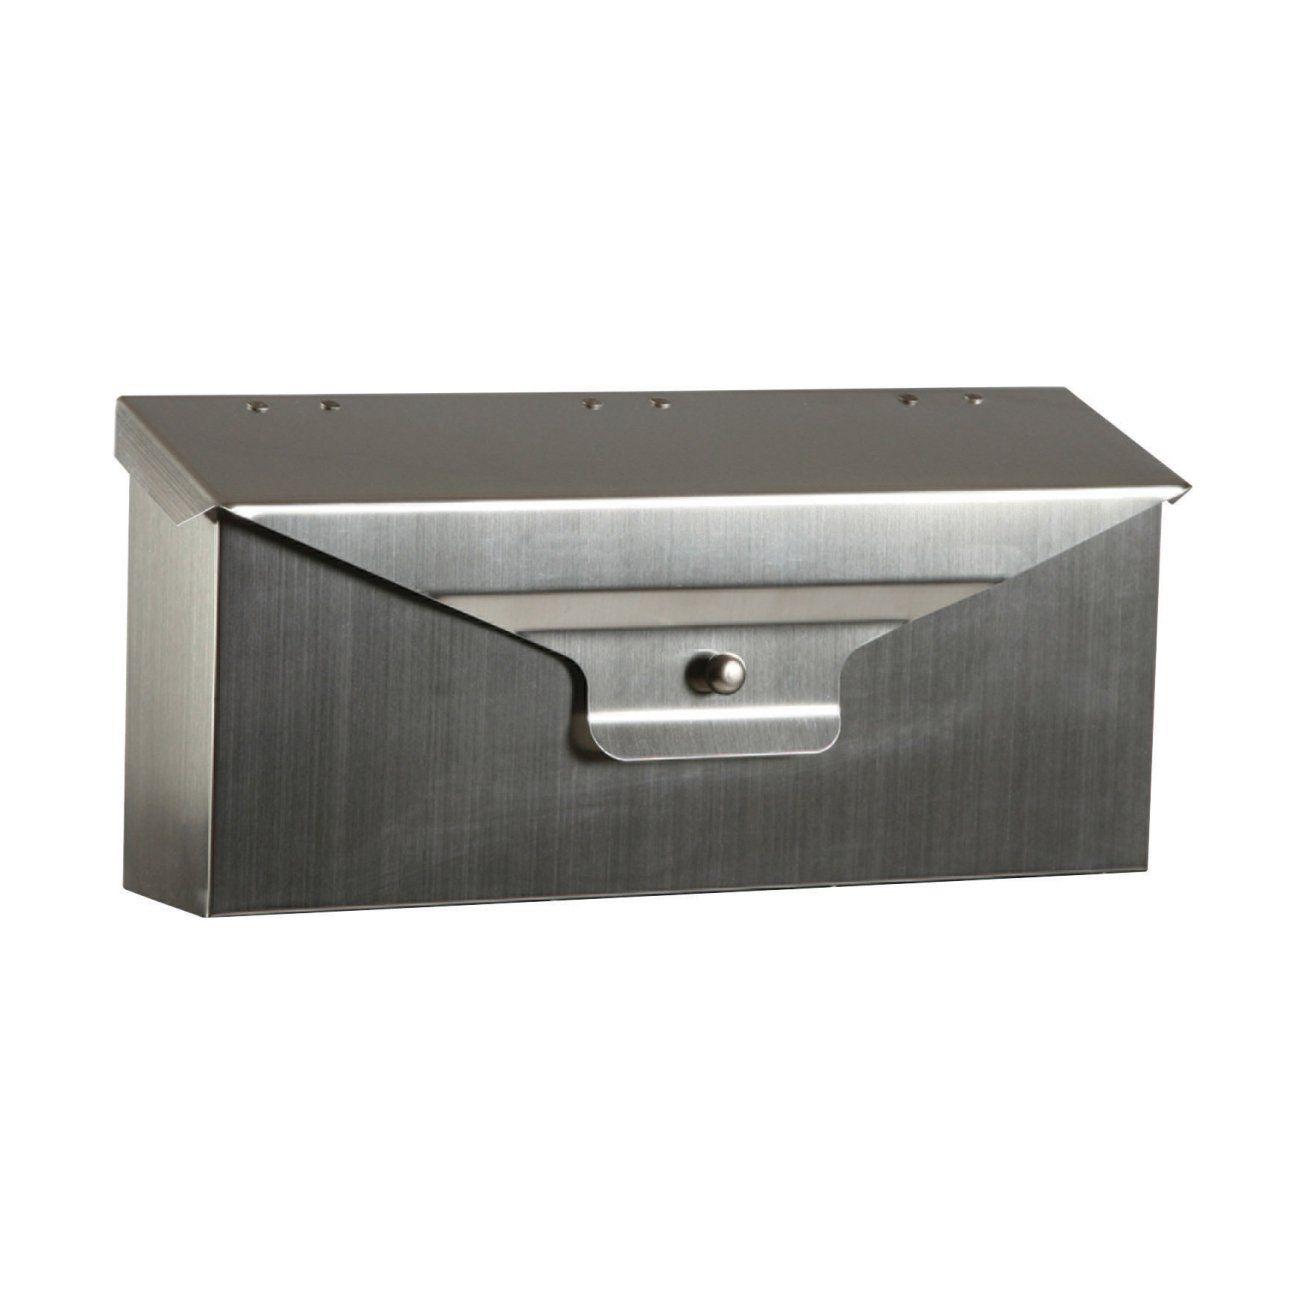 35 21 Amazon Com Gibraltar Mailbox 6 9 H X 15 6 W X 3 8 D Stn Nkl Hardware Wall Mount Mailbox Mounted Mailbox Stainless Steel Mailbox